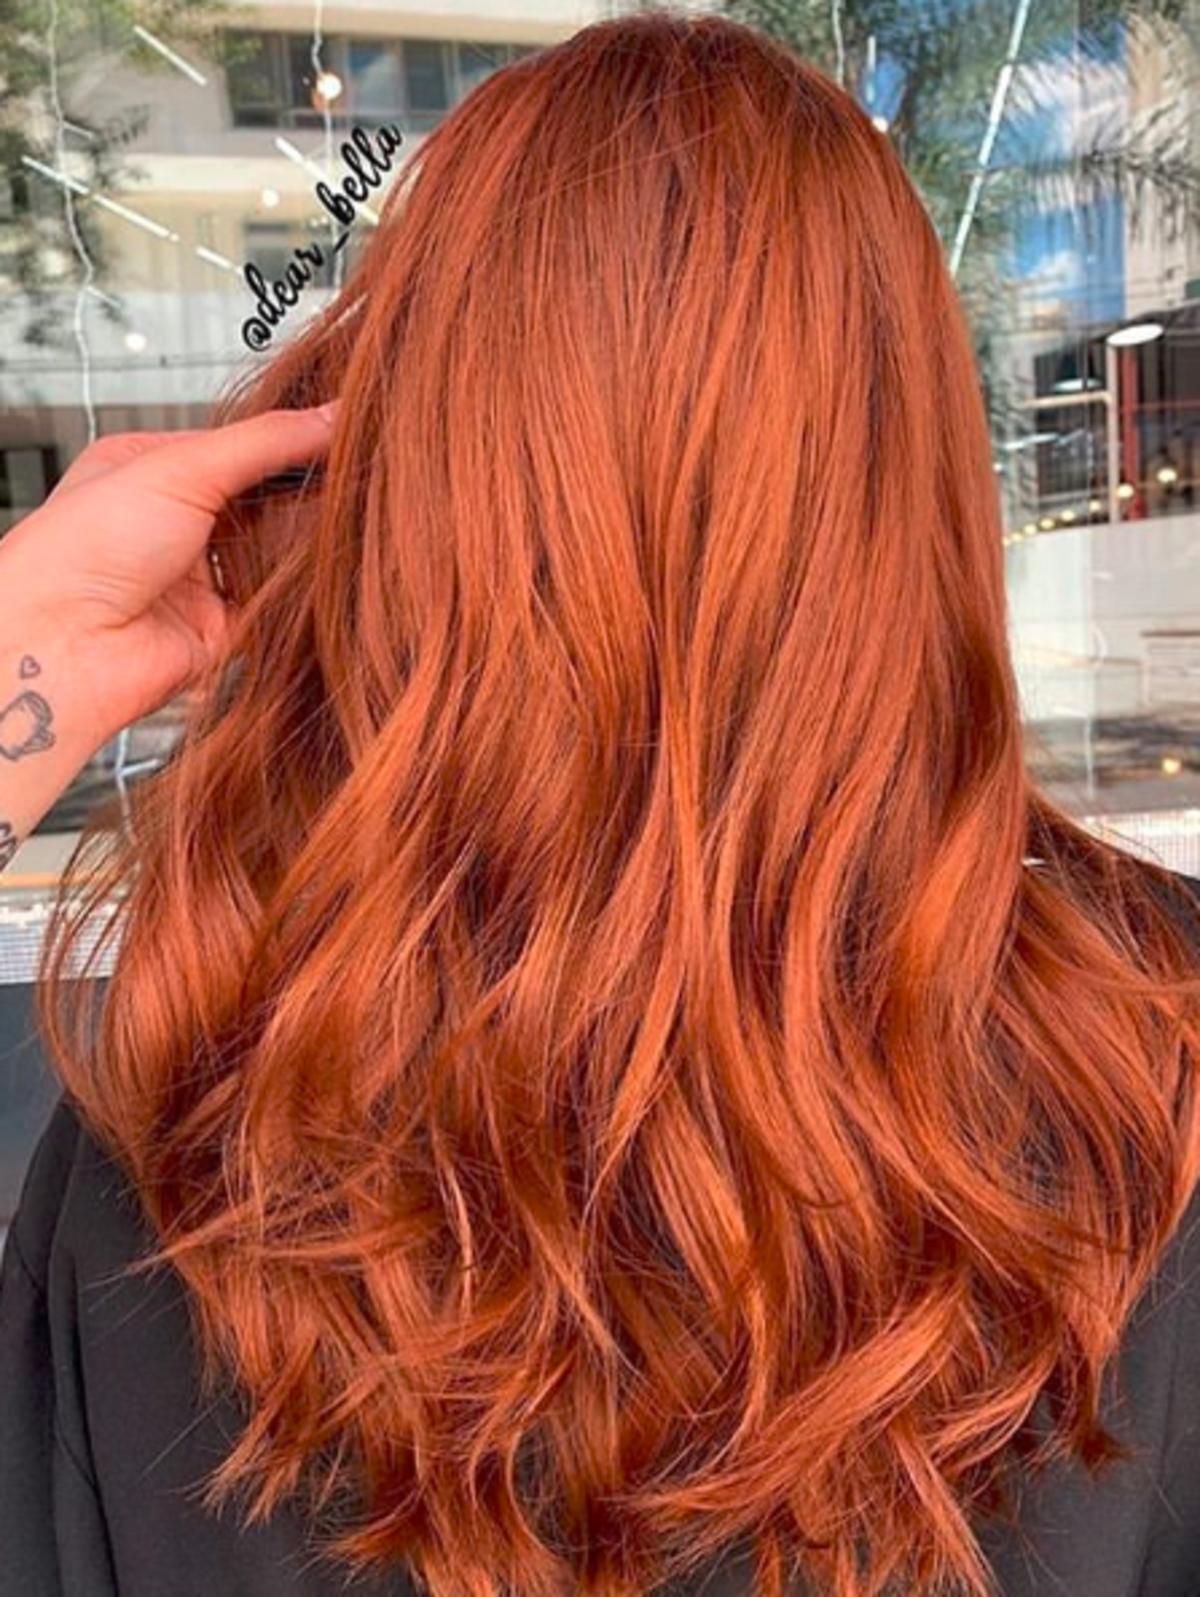 Ginger hair - modna koloryzacja